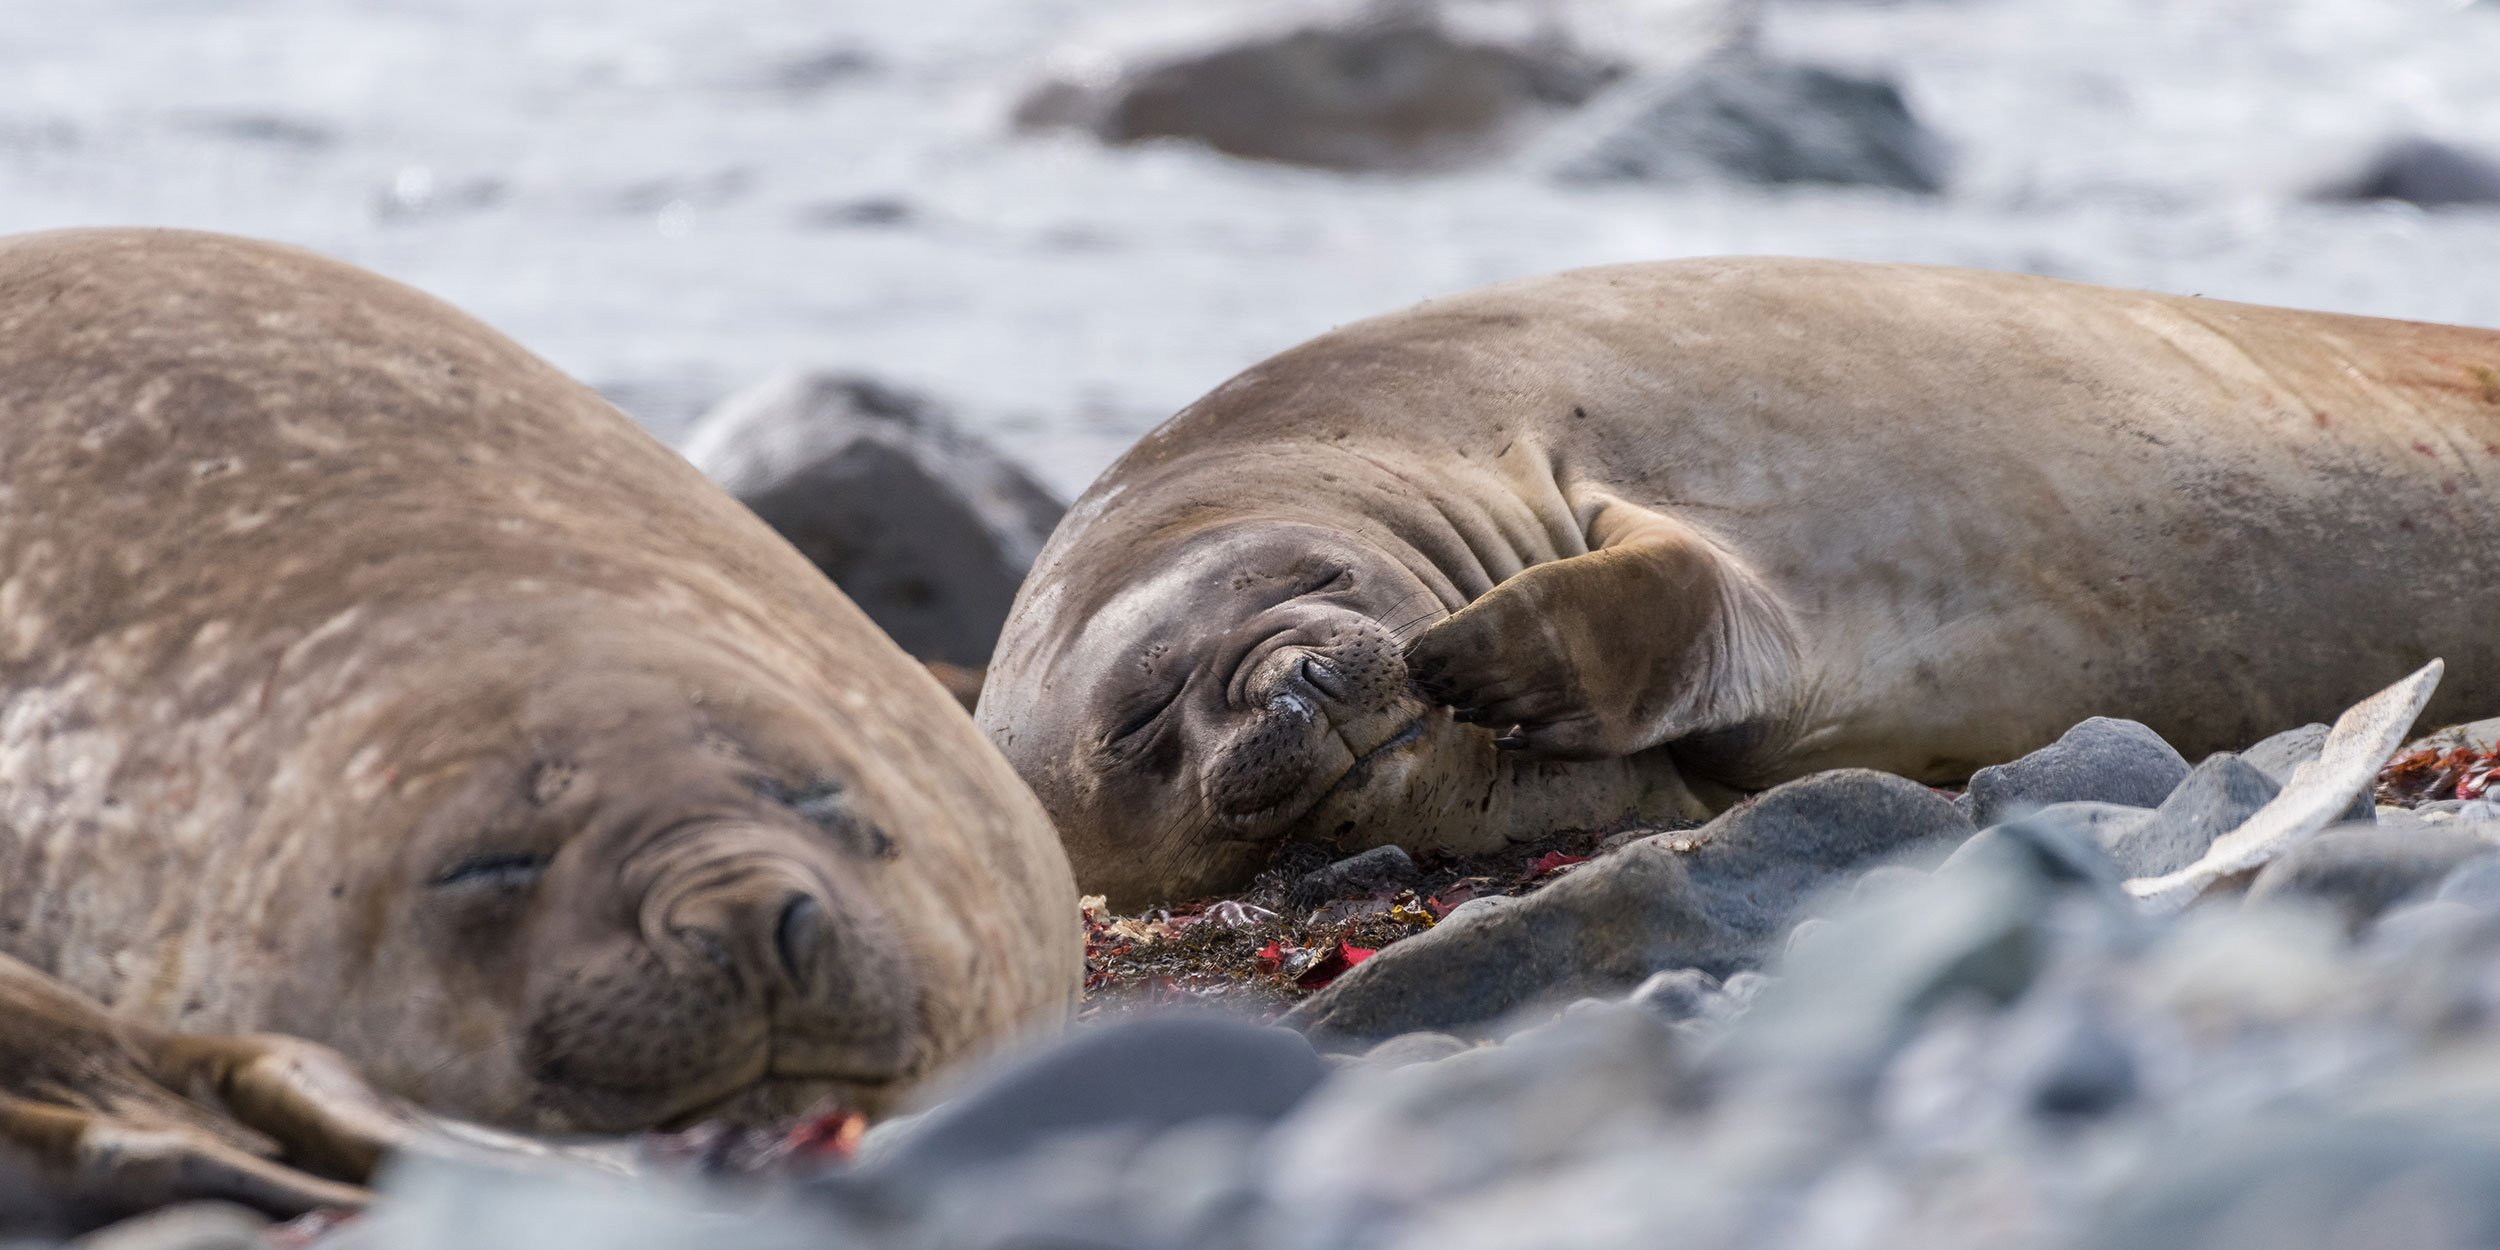 What animals live in Antarctica